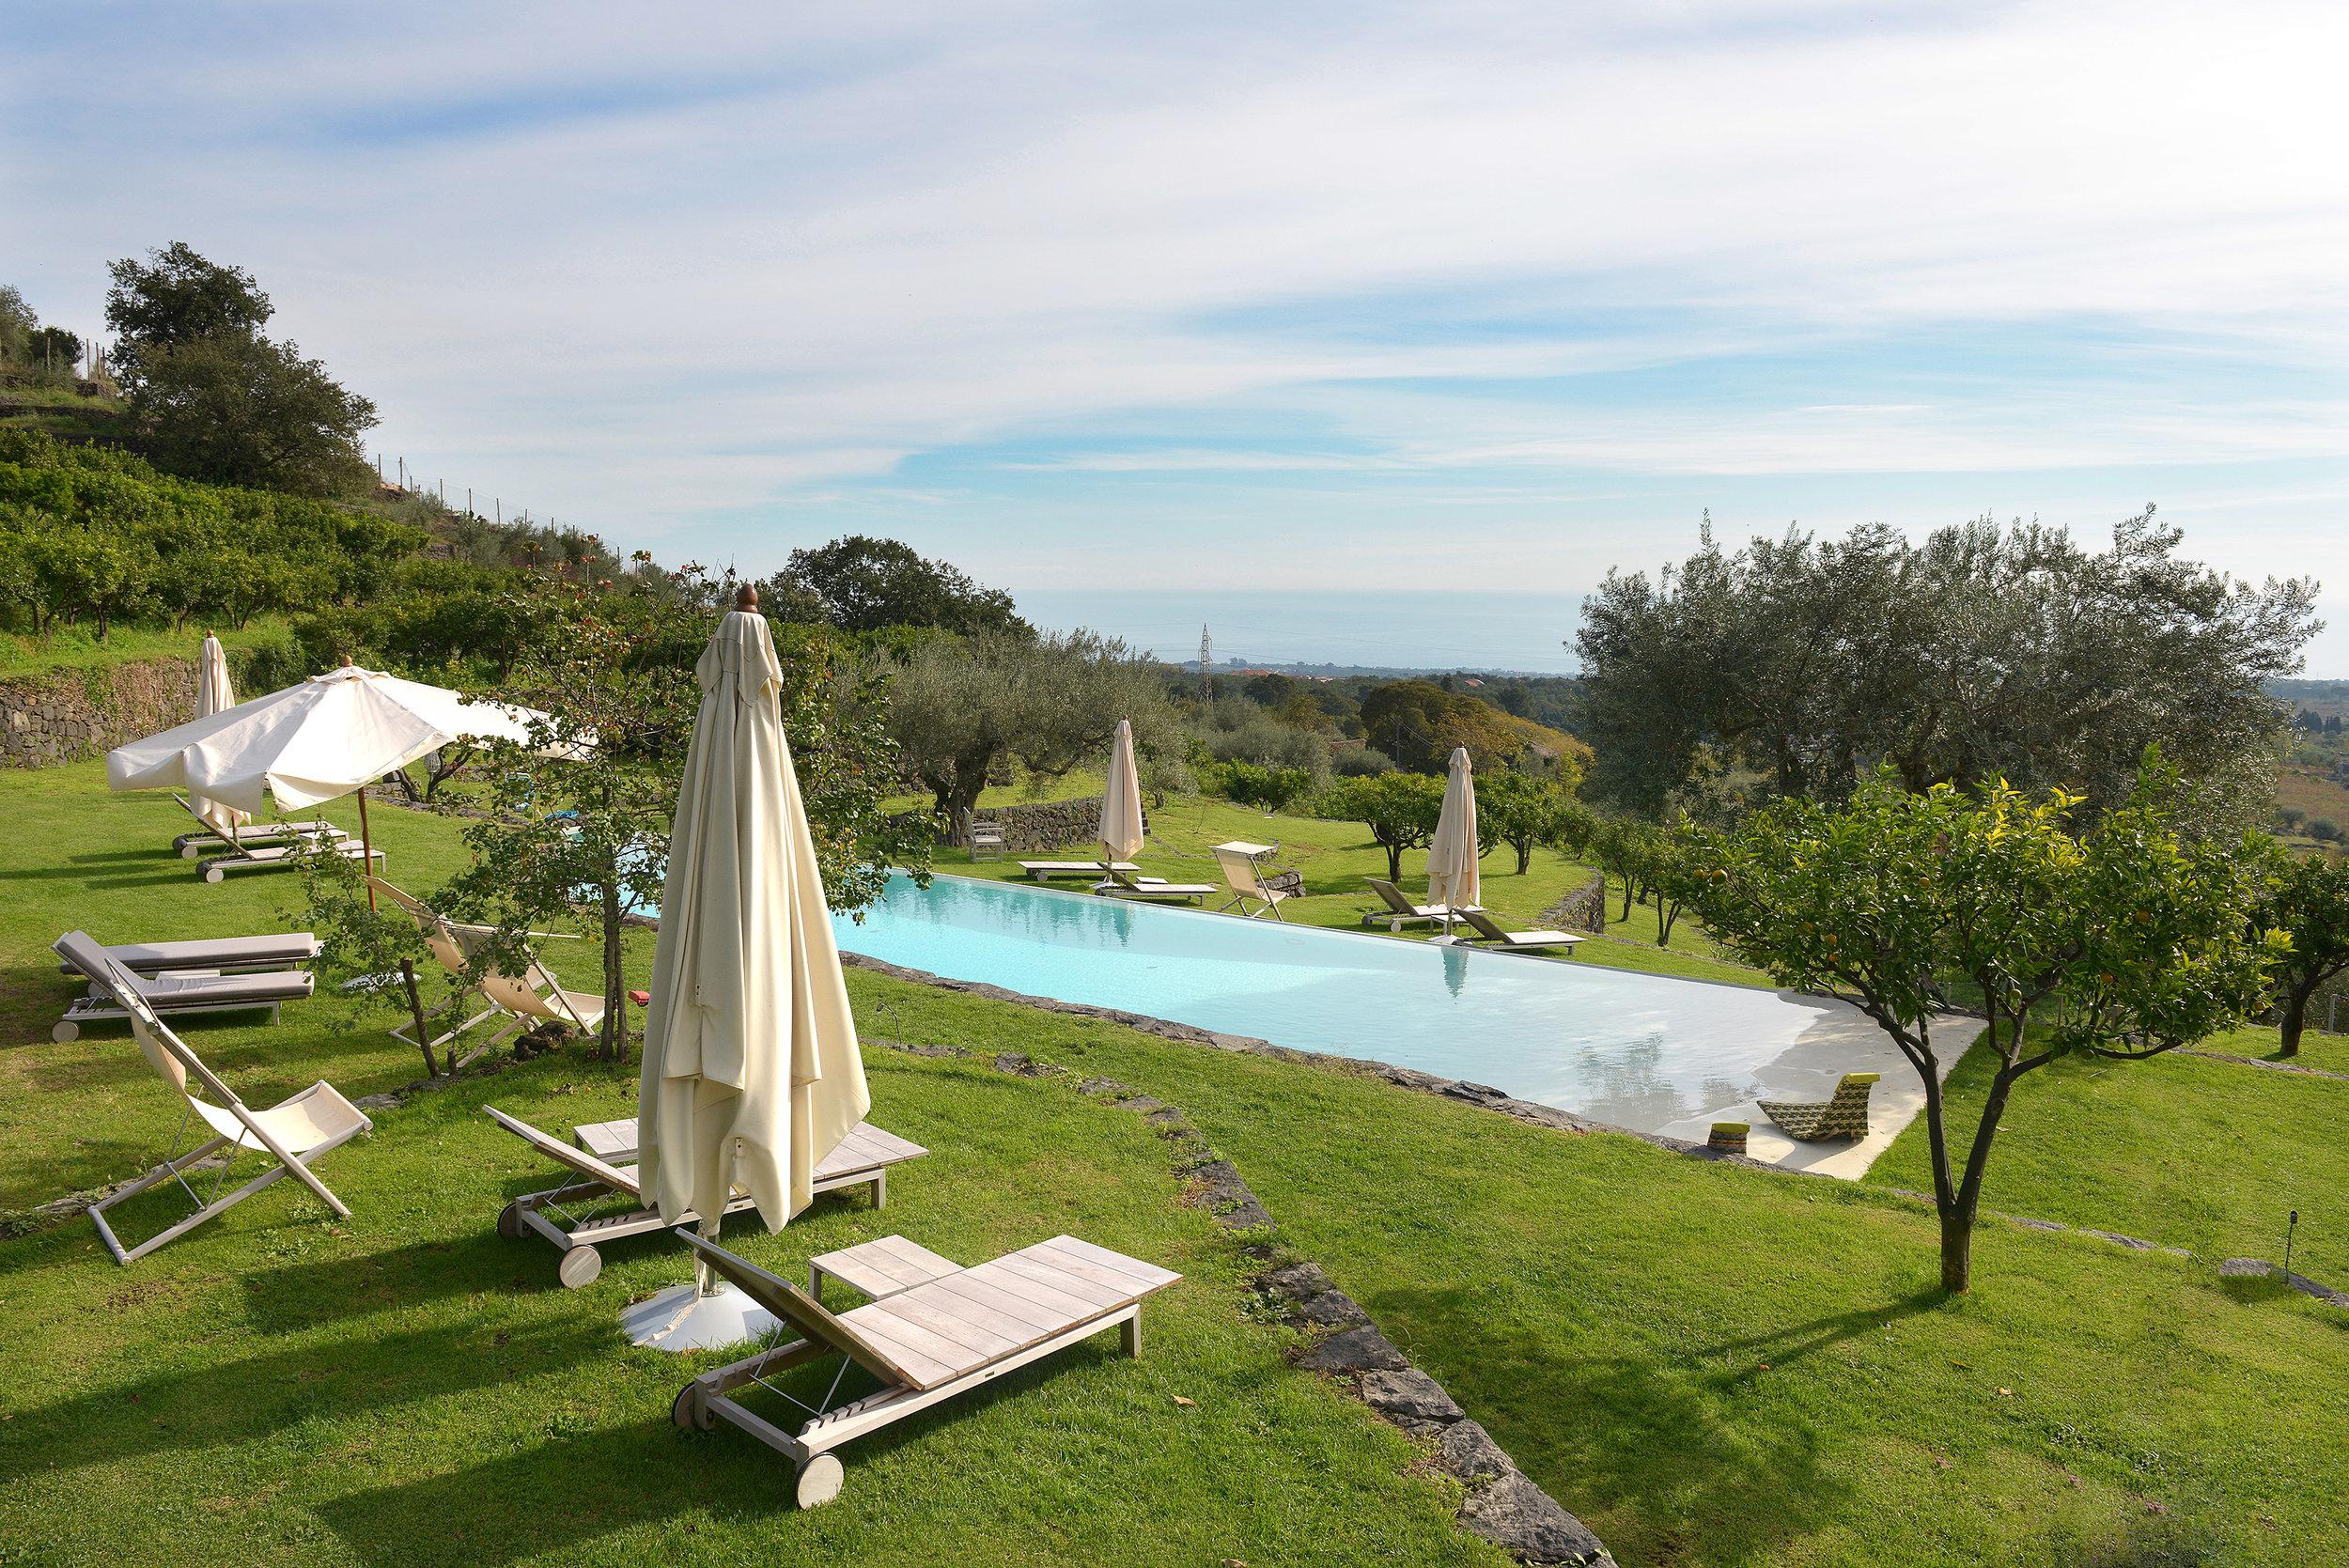 Hotelli, Sisilia, uima-allas